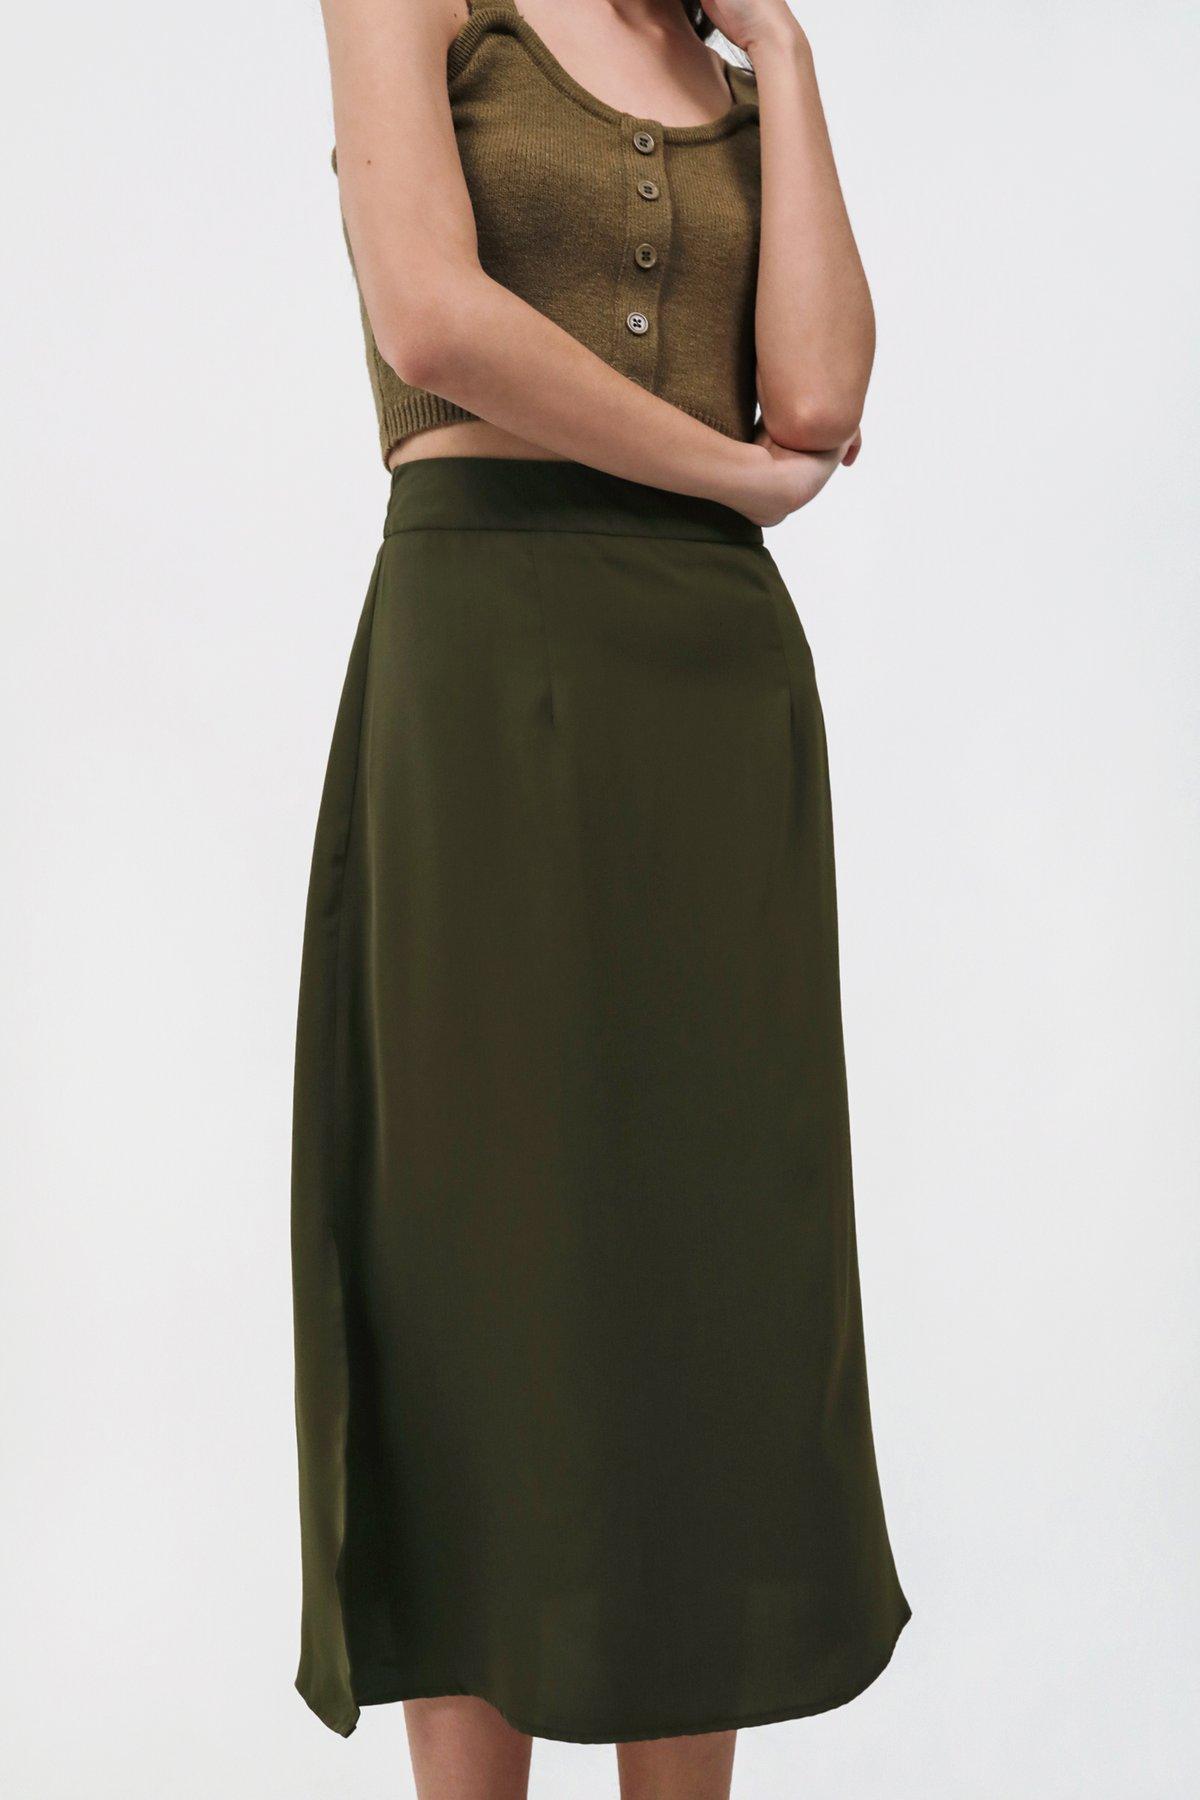 Issa Skirt (Olive)